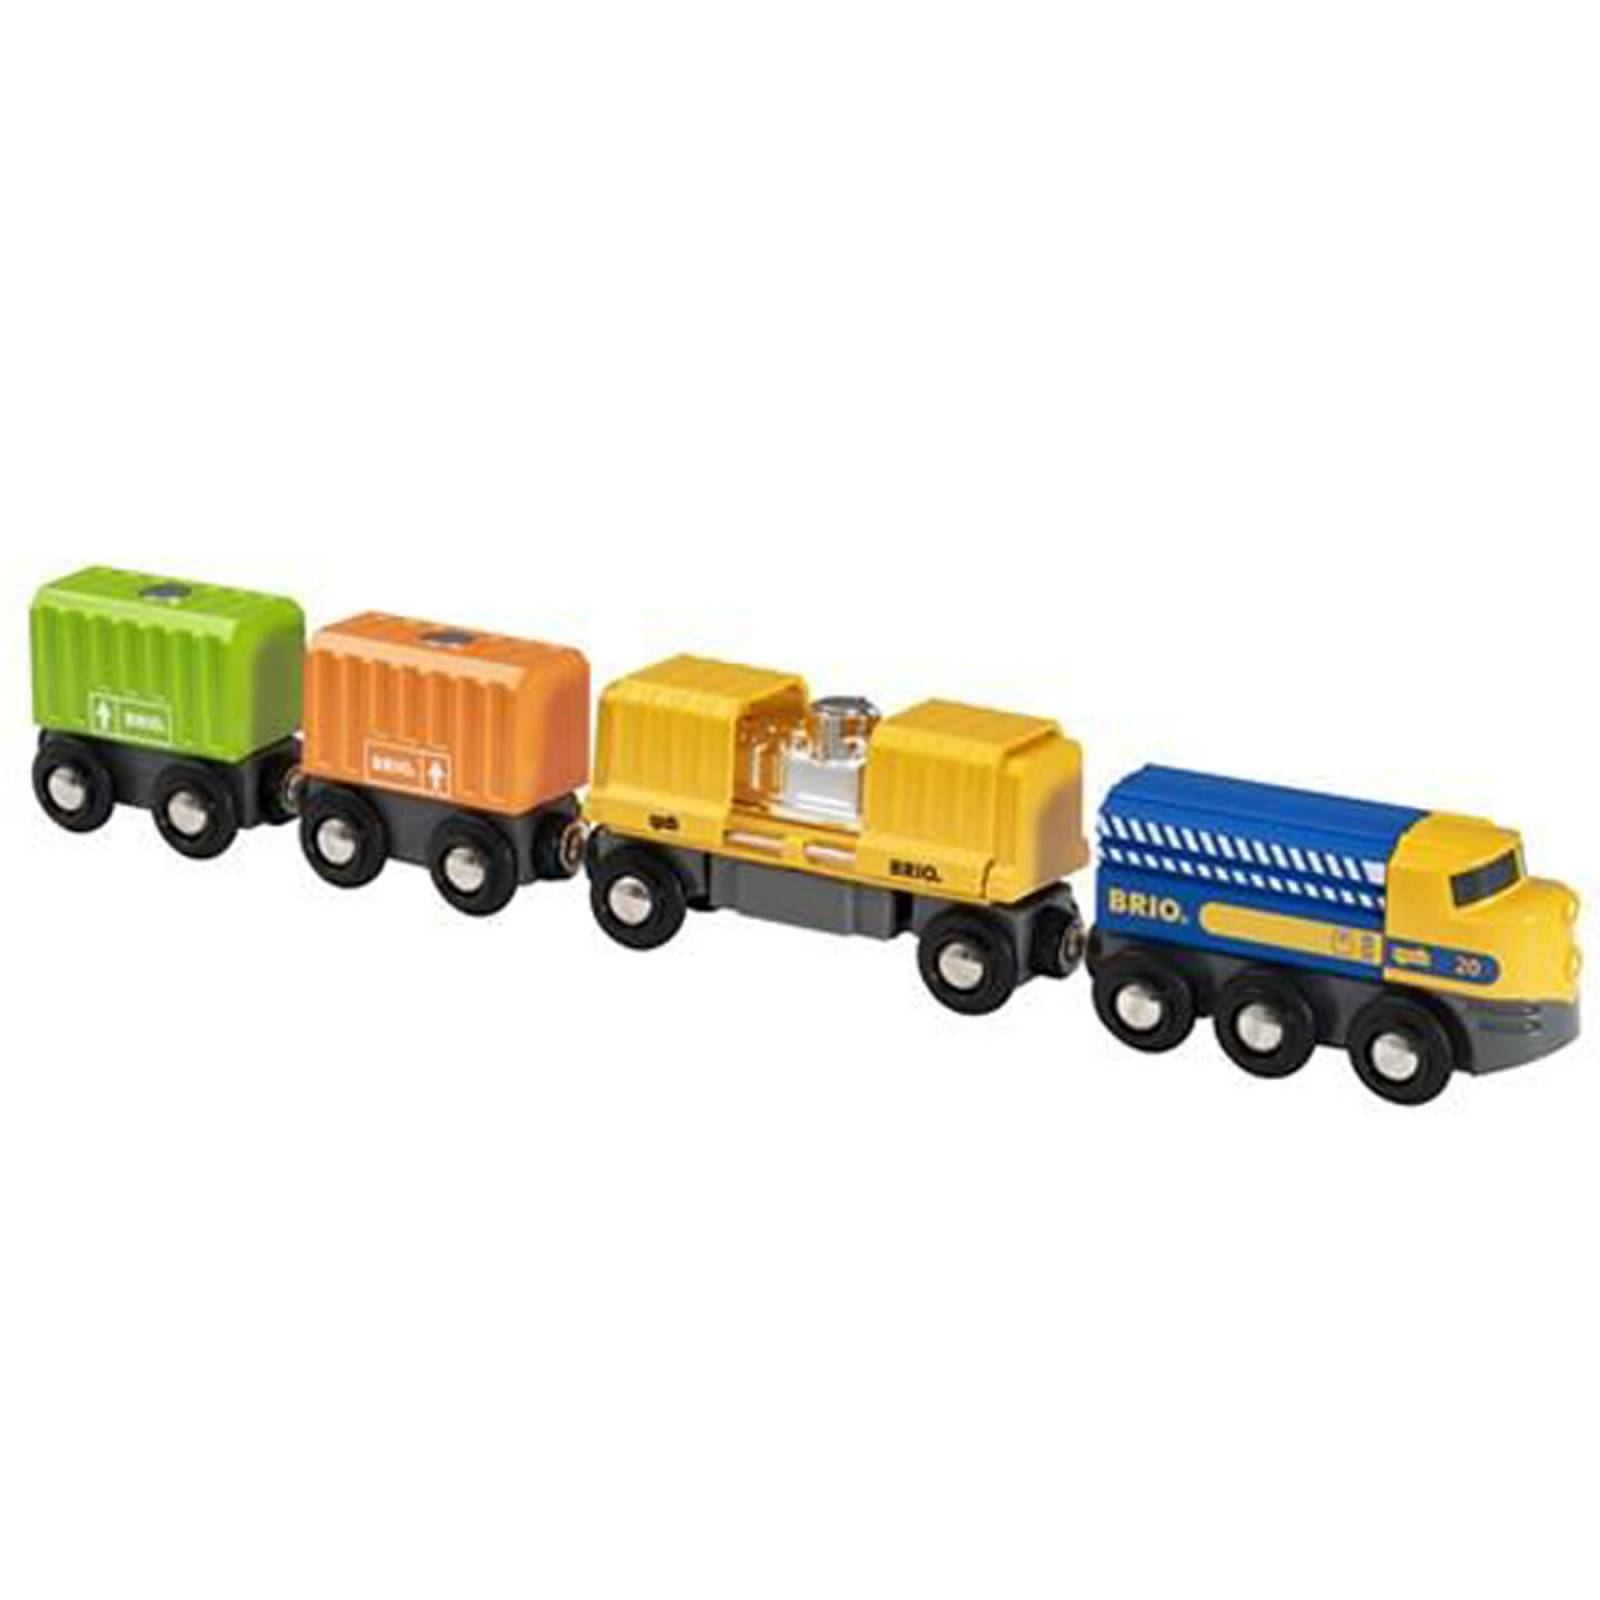 Three-Wagon Cargo Train BRIO Wooden Railway Age 3+ thumbnails